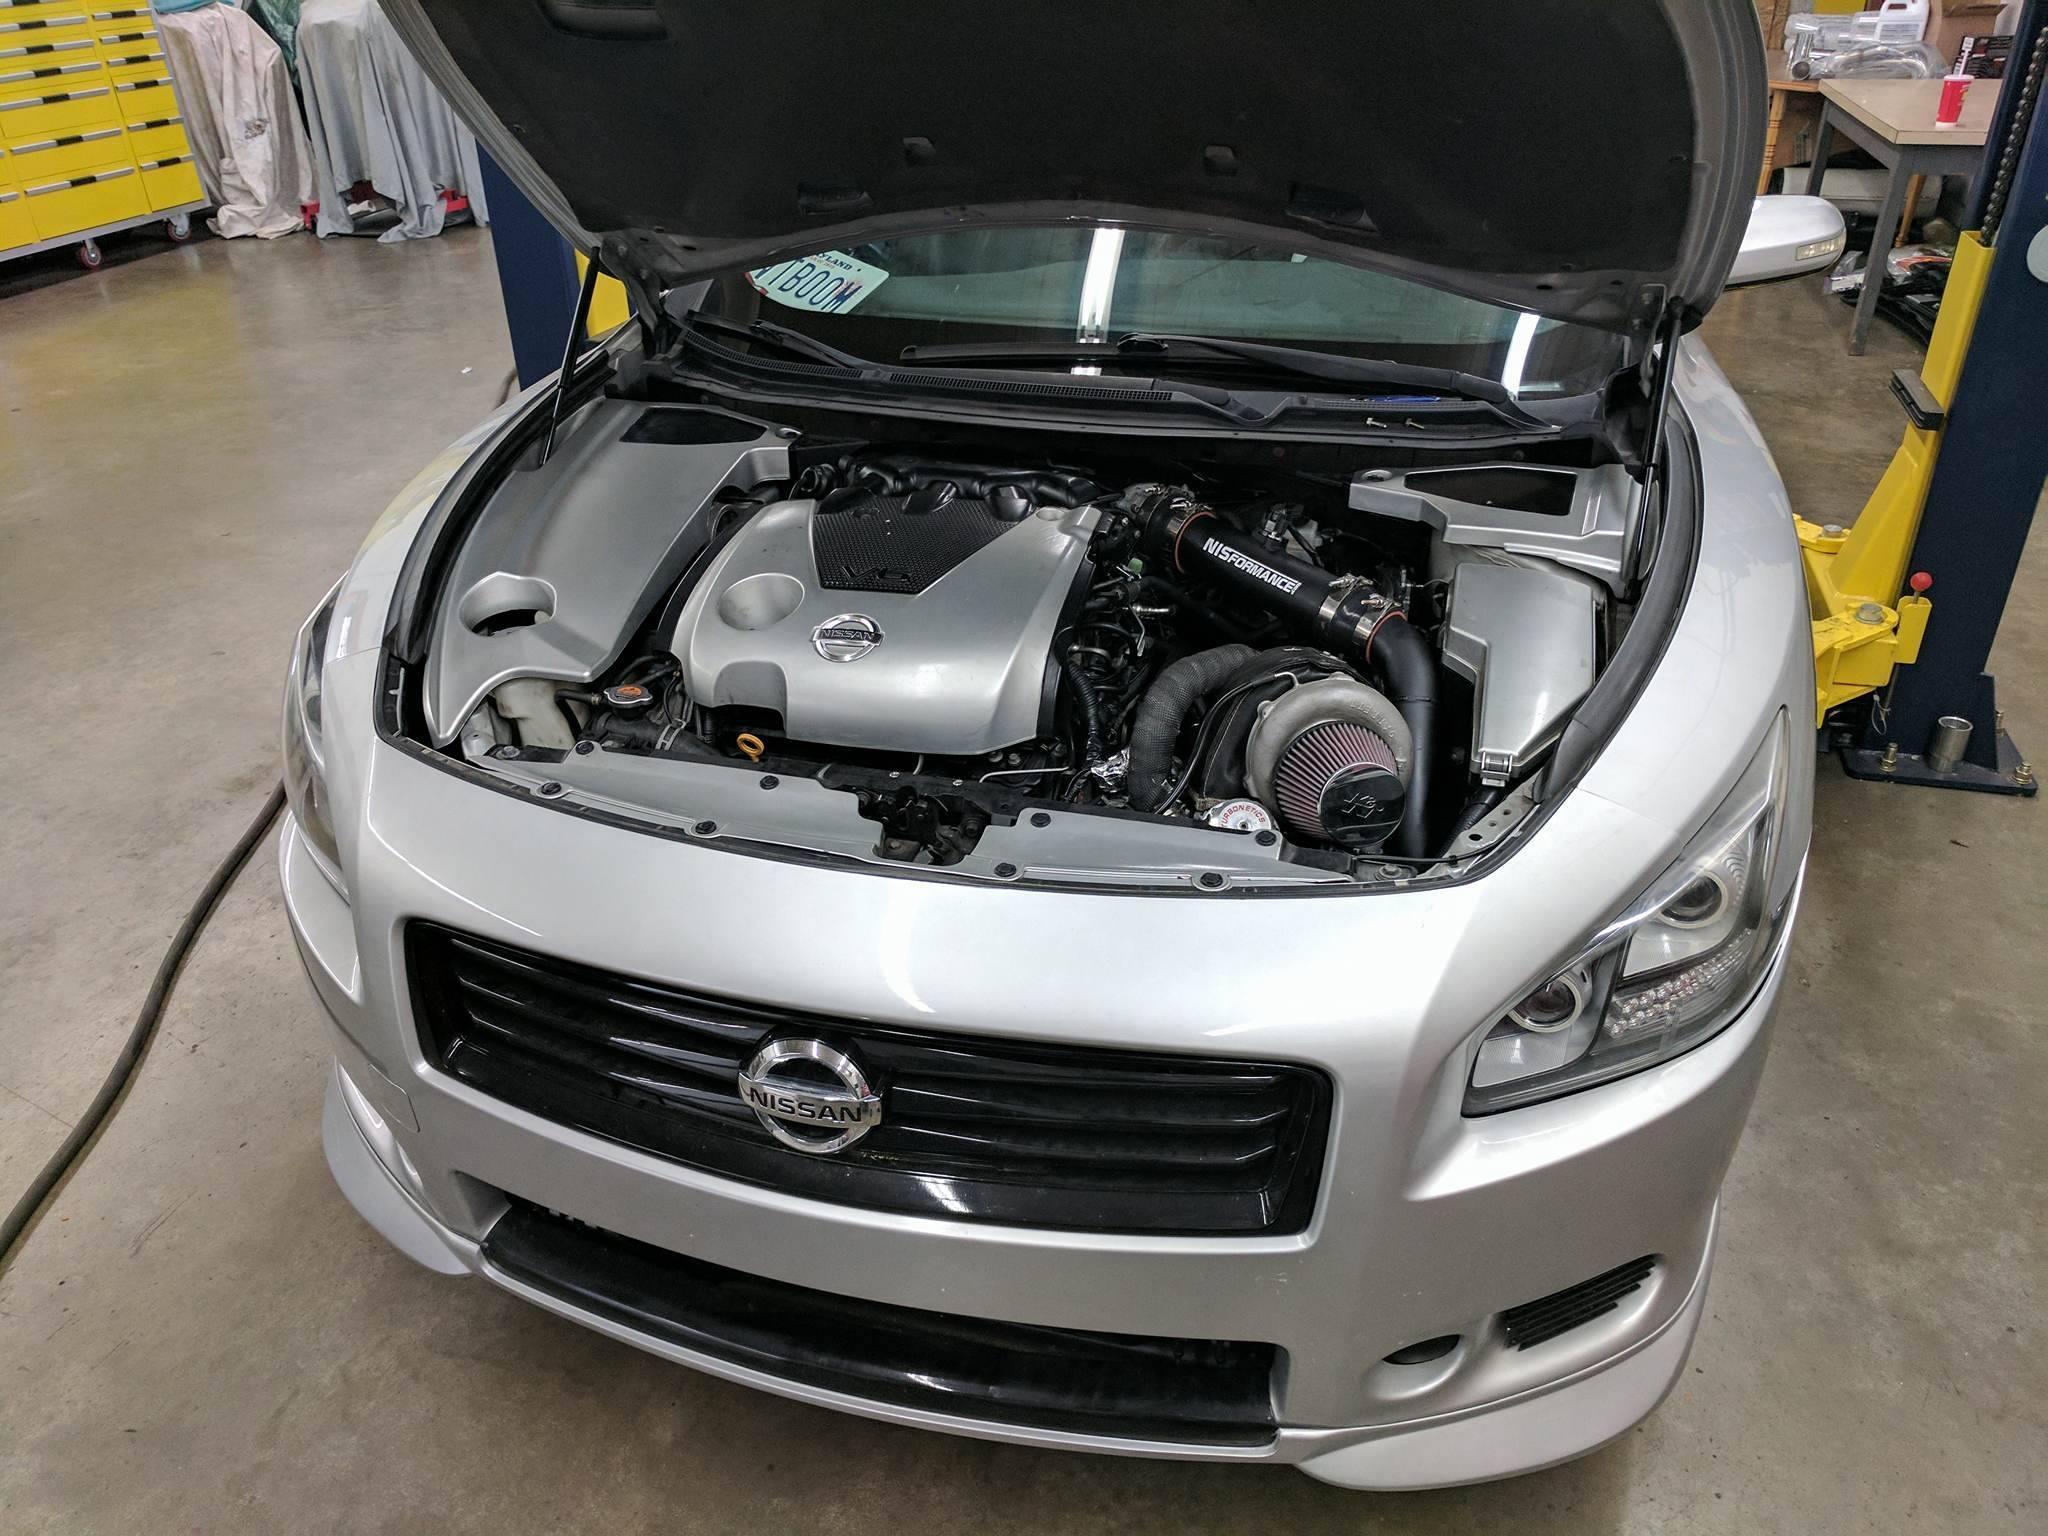 2013 Nissan Maxima Fuse Box Dan Evan S Turbo 6 Speed Manual 7gm My4dsc Com Premier